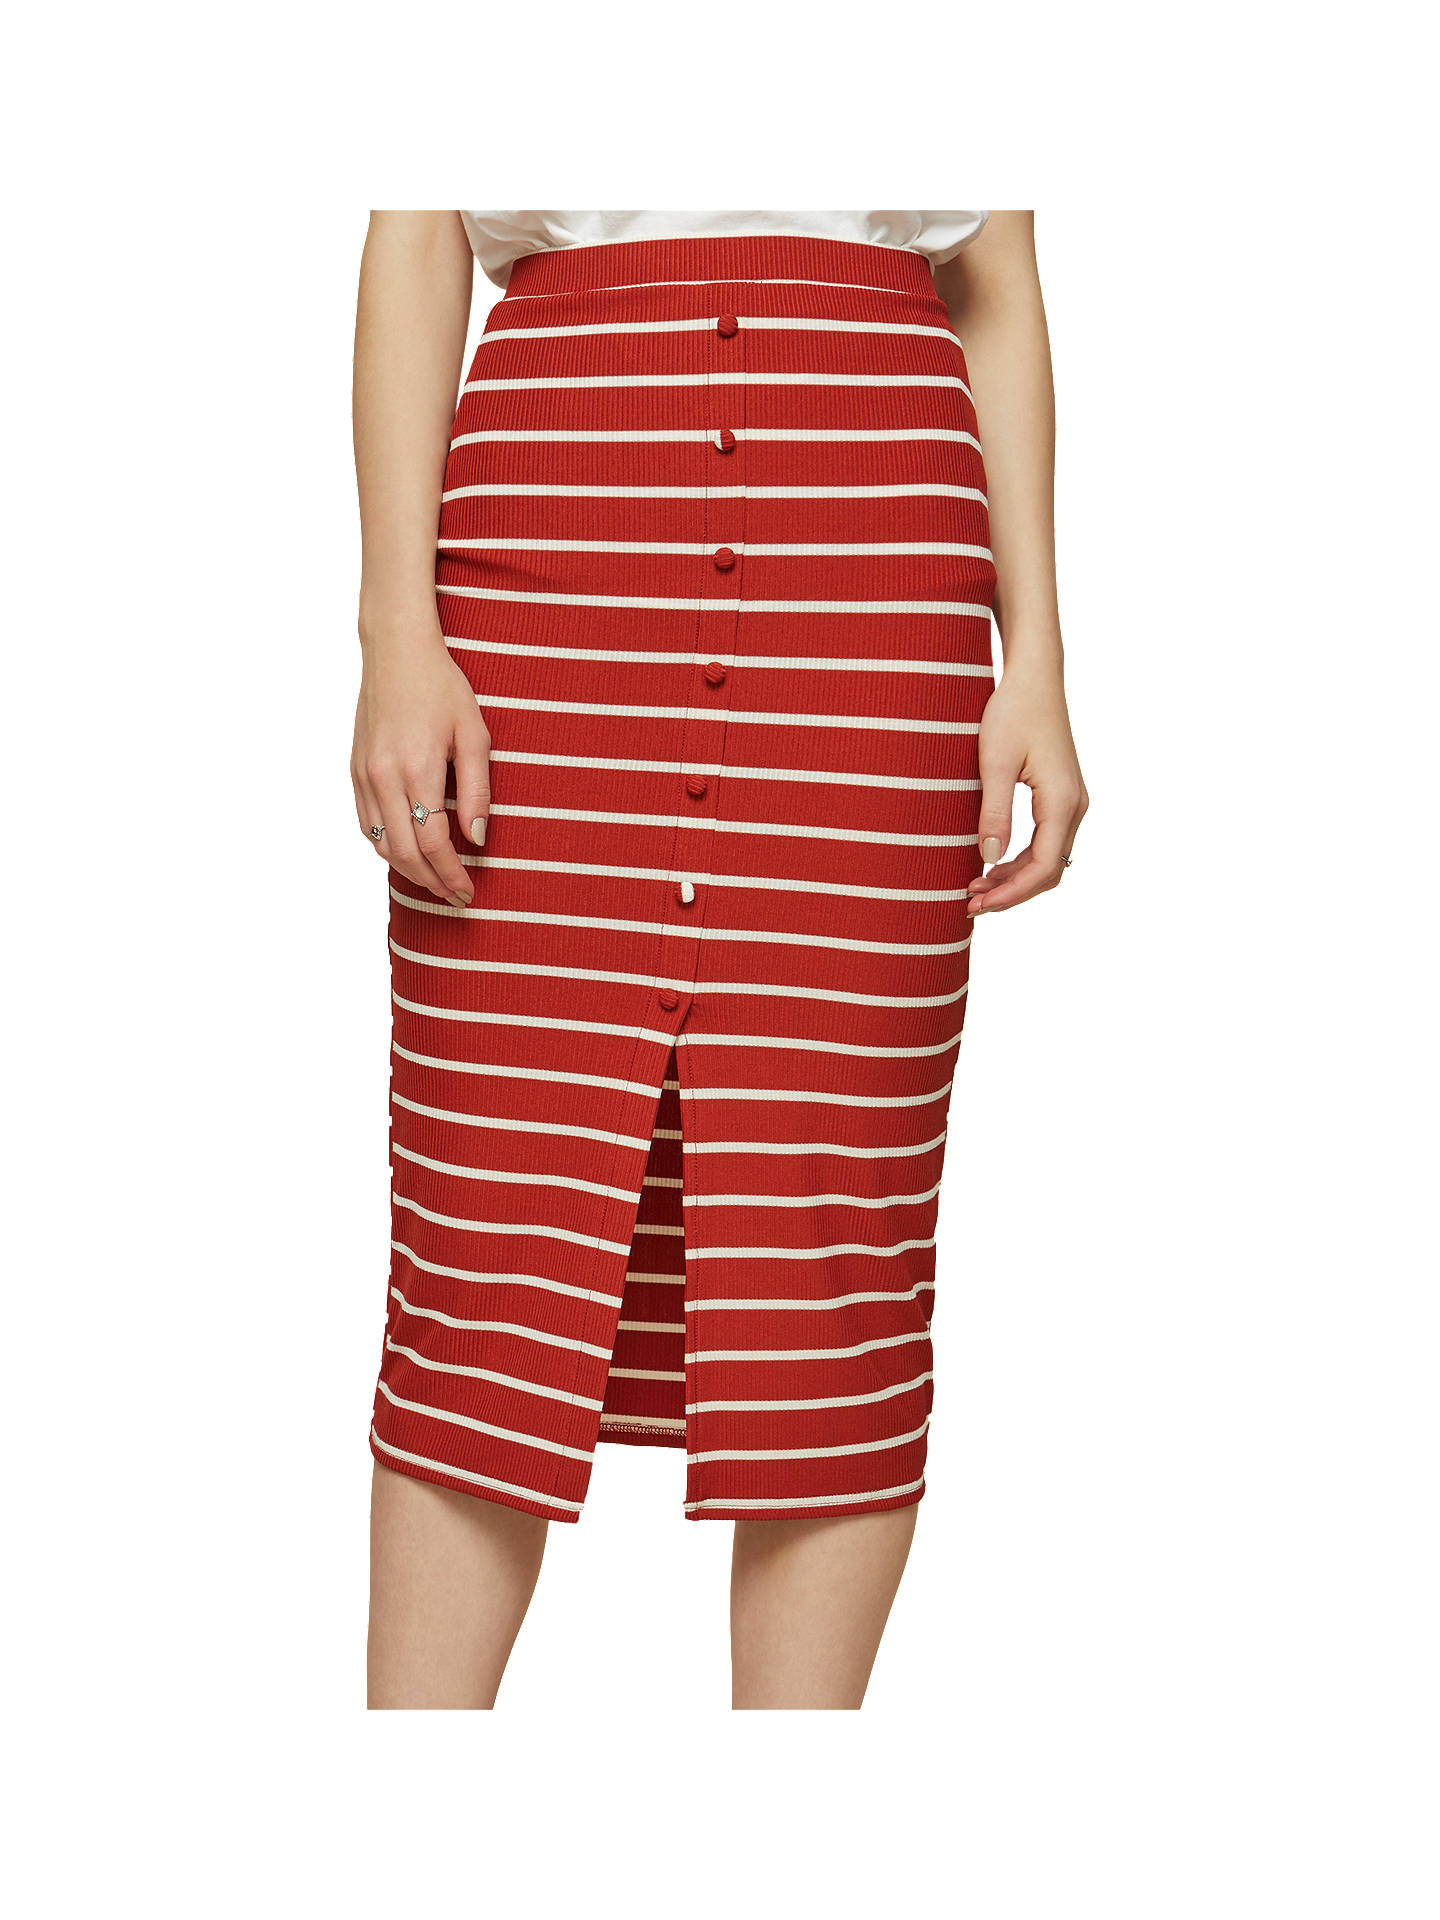 03a612ec0c64 Buy Miss Selfridge Striped Button Front Midi Skirt, Brown, 6 Online at  johnlewis.